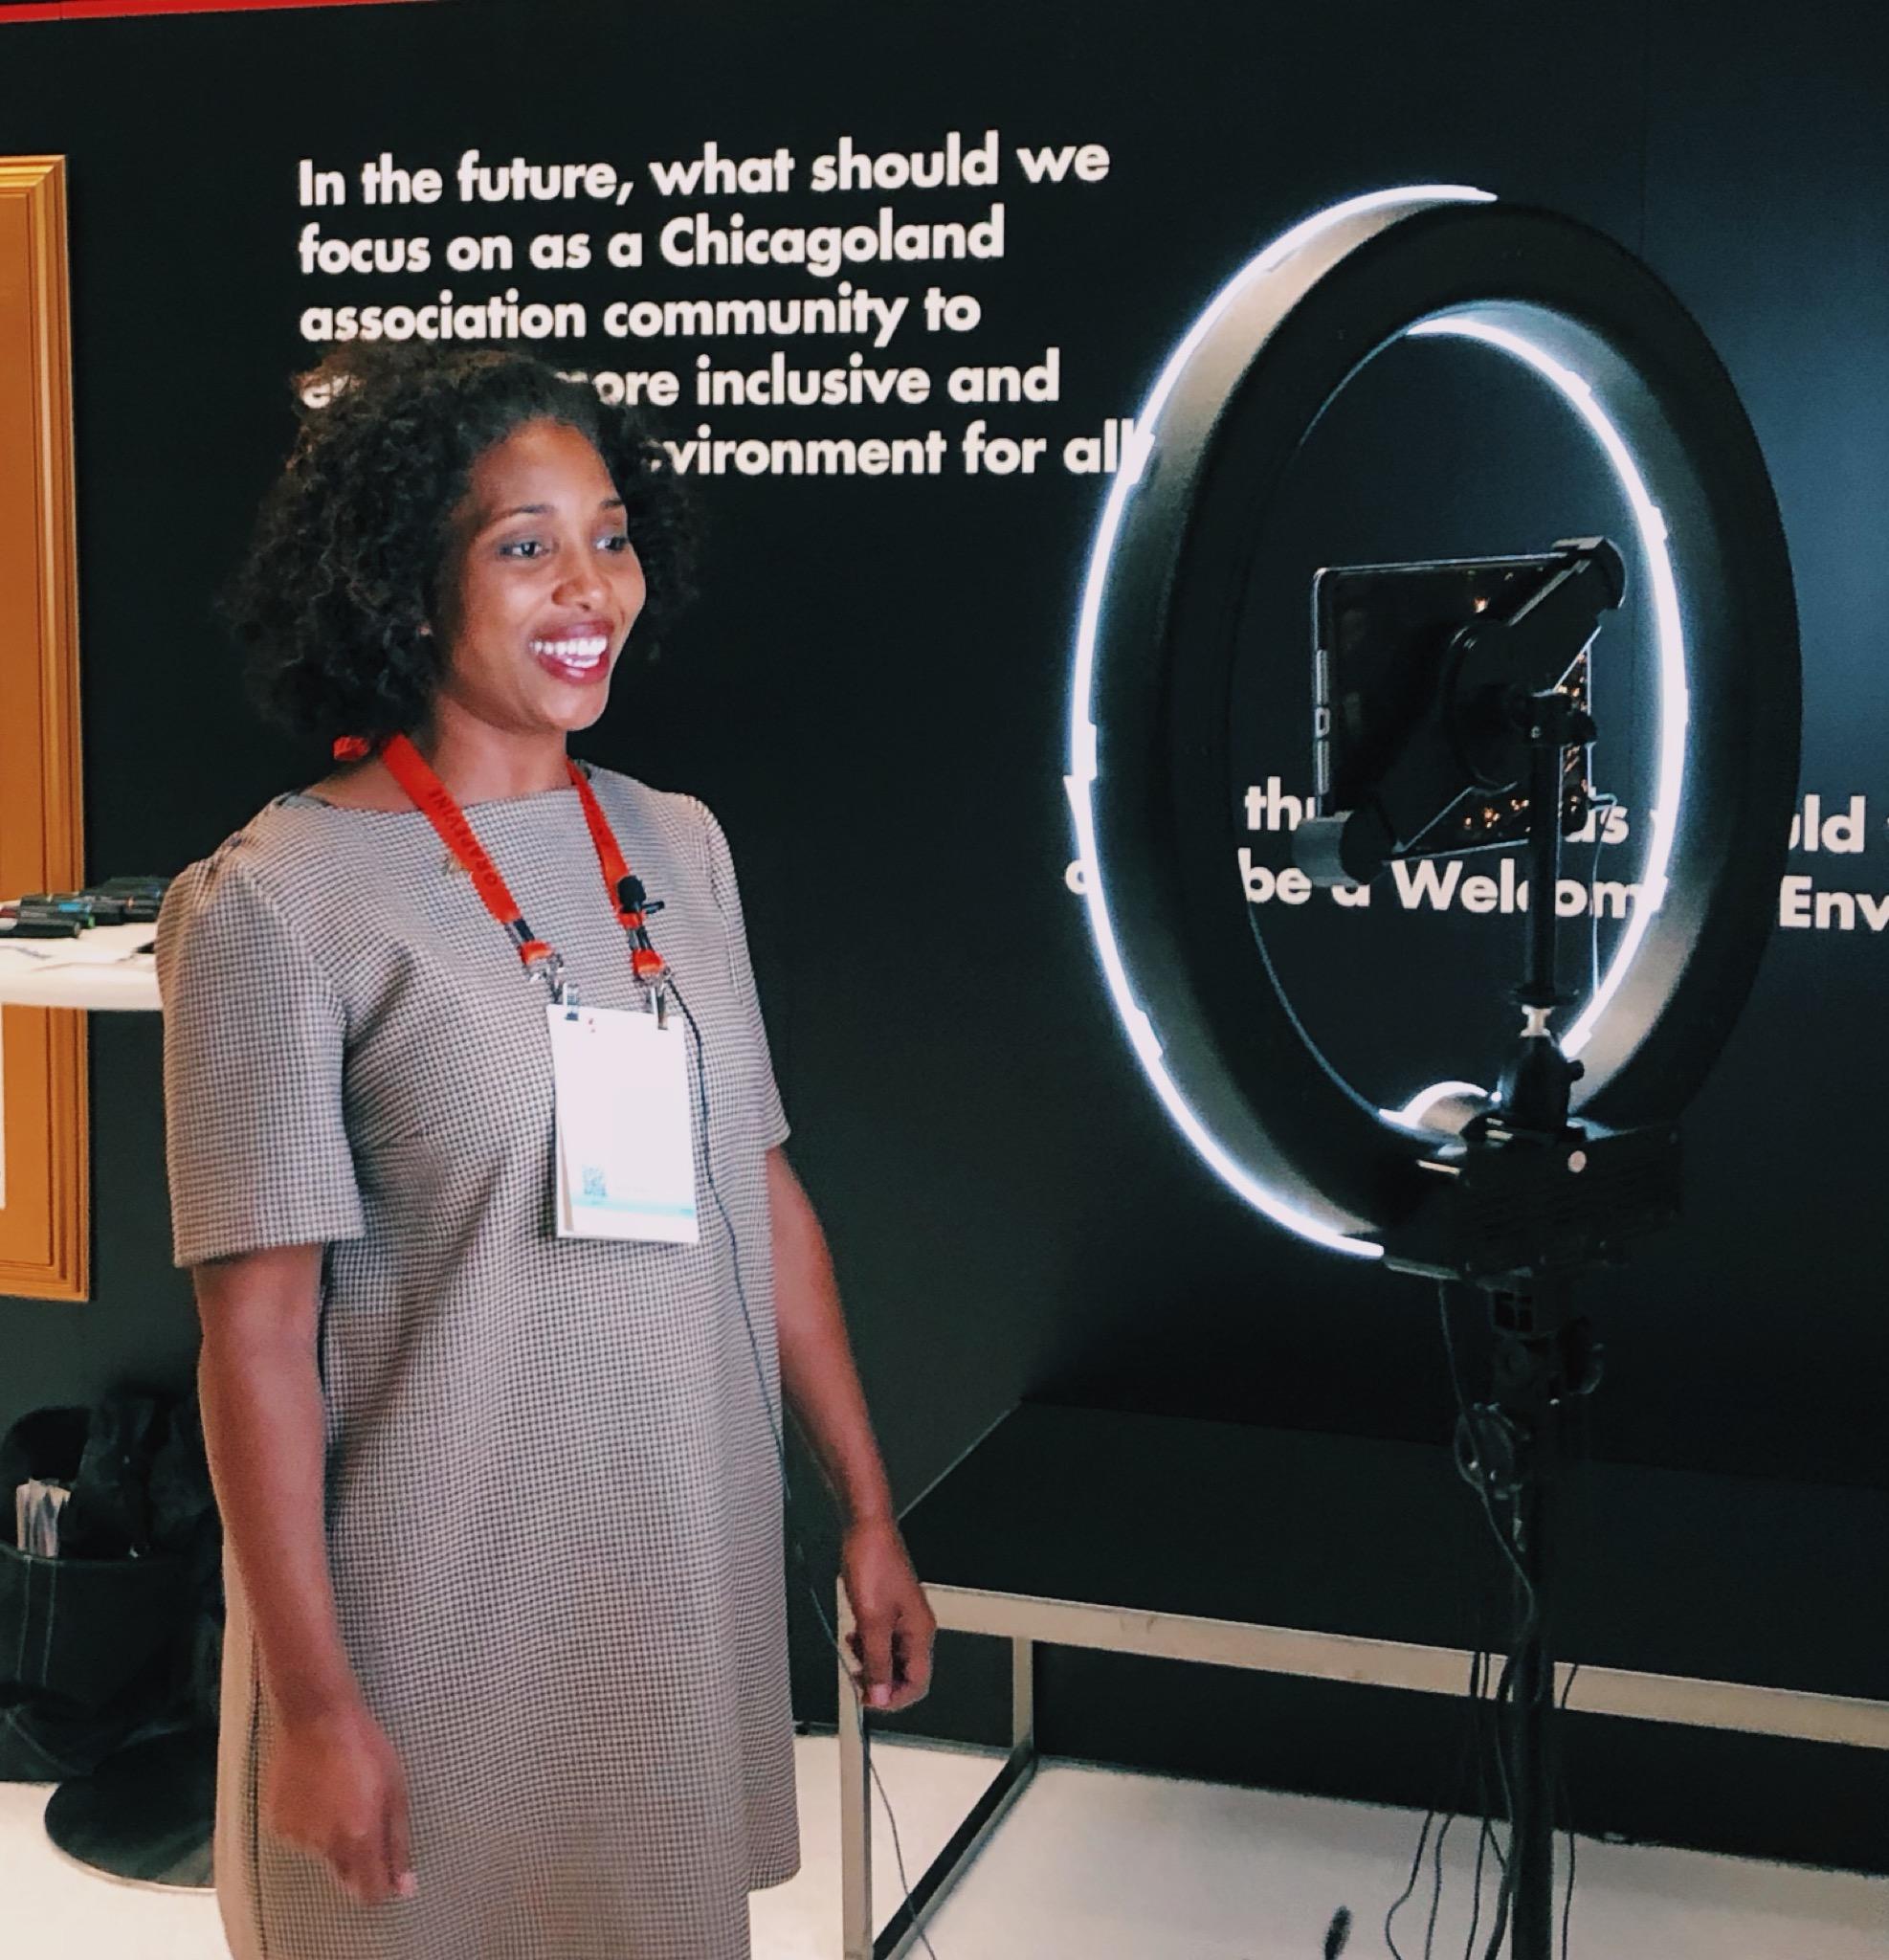 The Gather Voices Video Kiosk